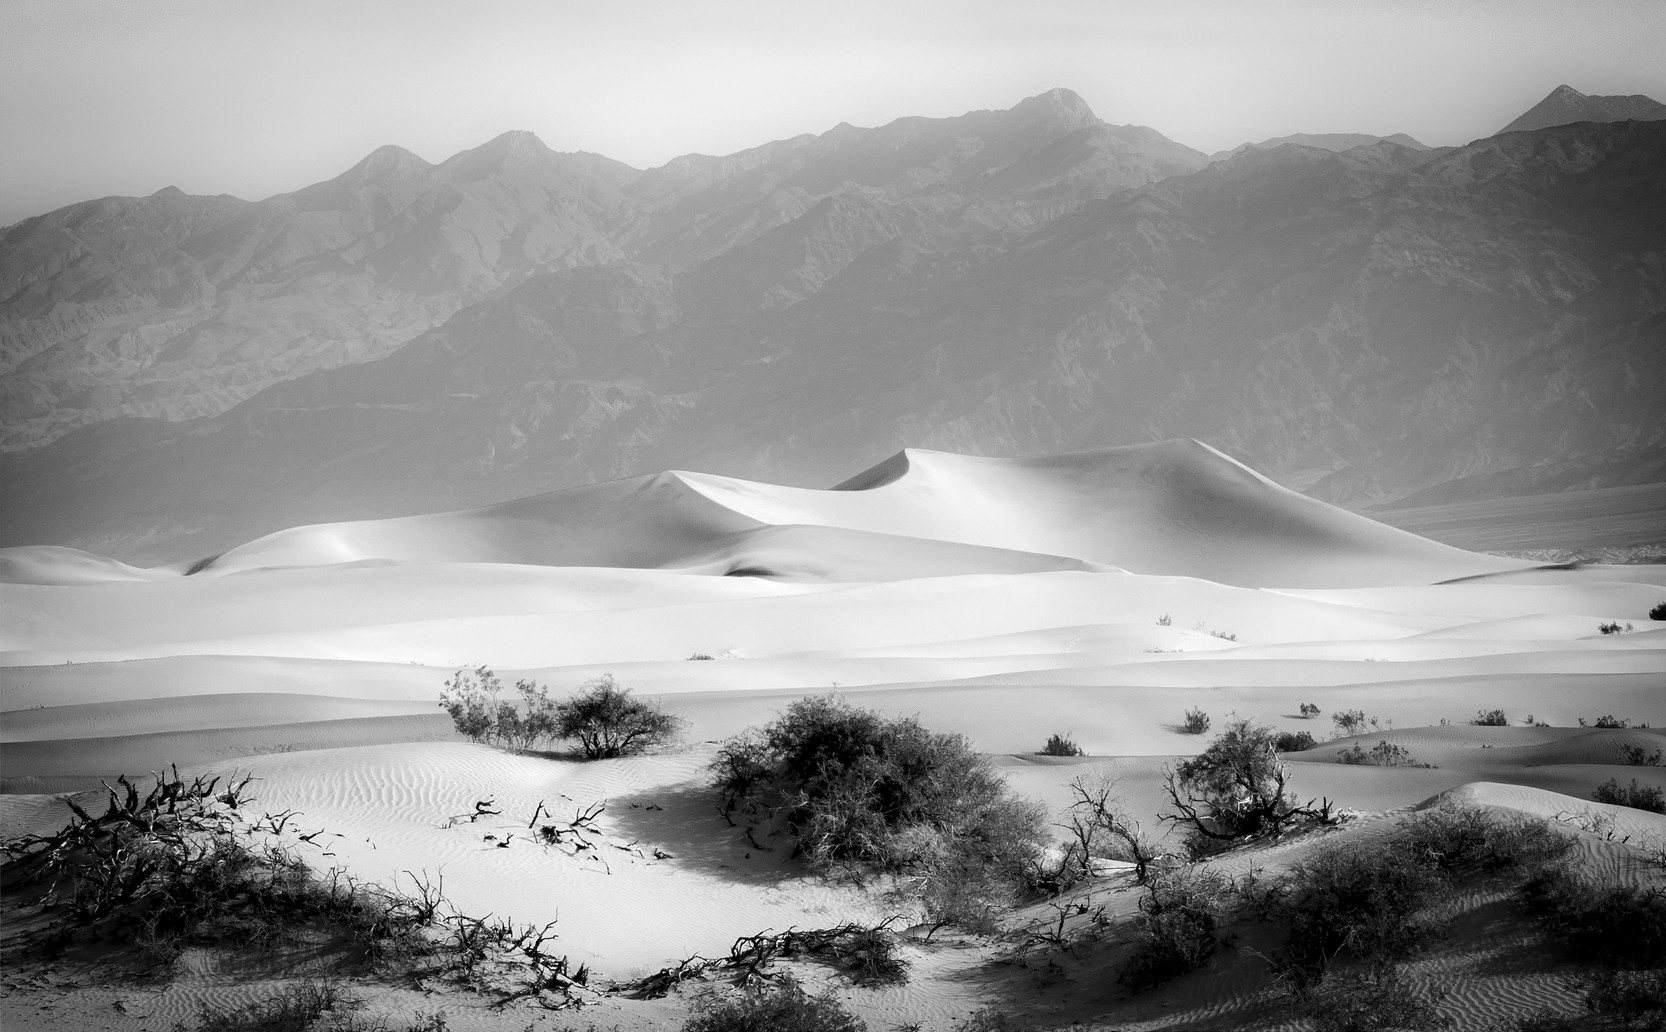 Dunes in the Morning Haze